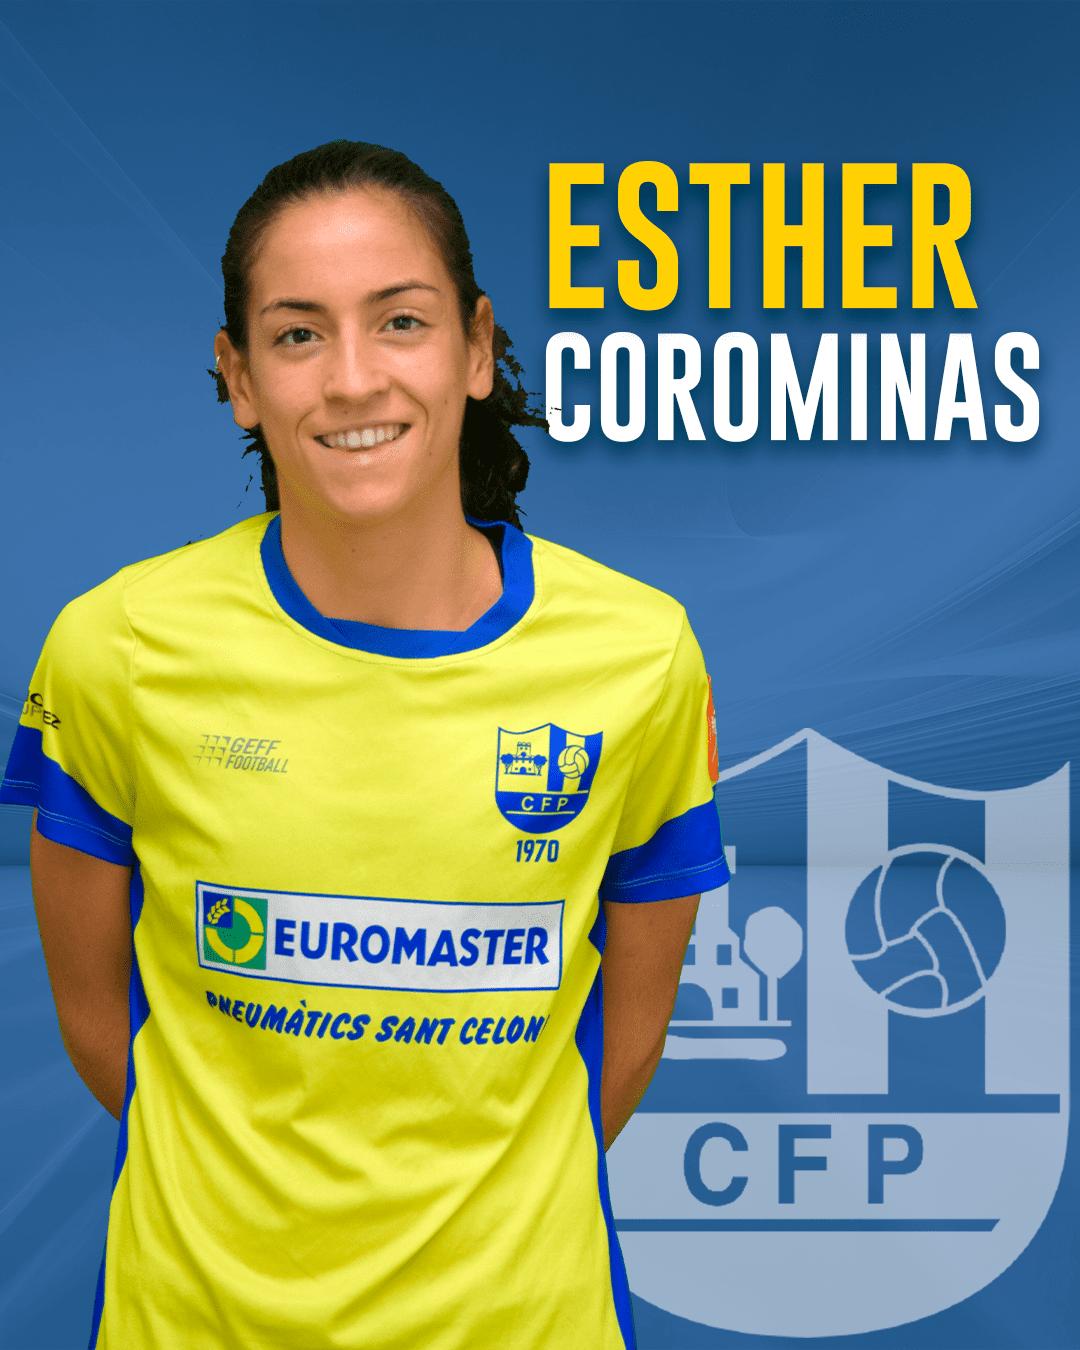 Esther Corominas